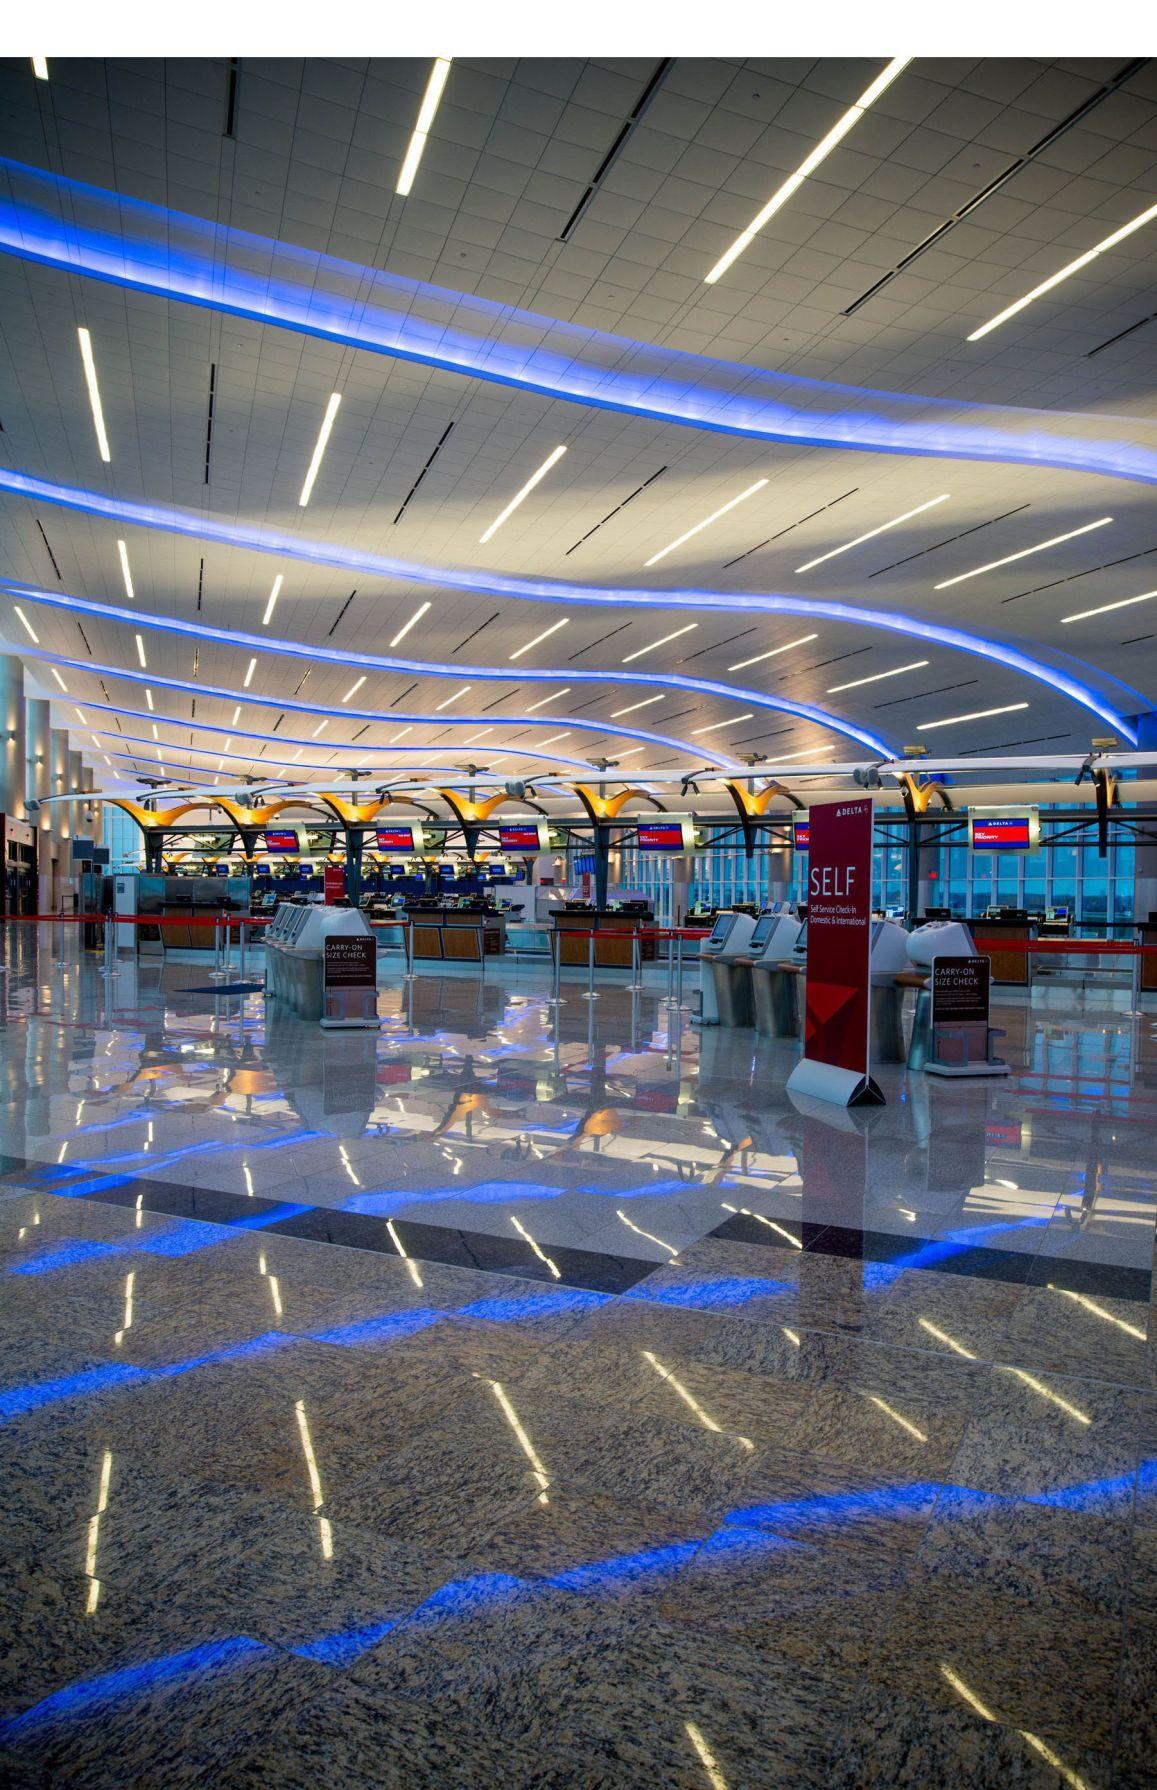 New terminal at Atlanta's Hartsfield-Jackson airport to open